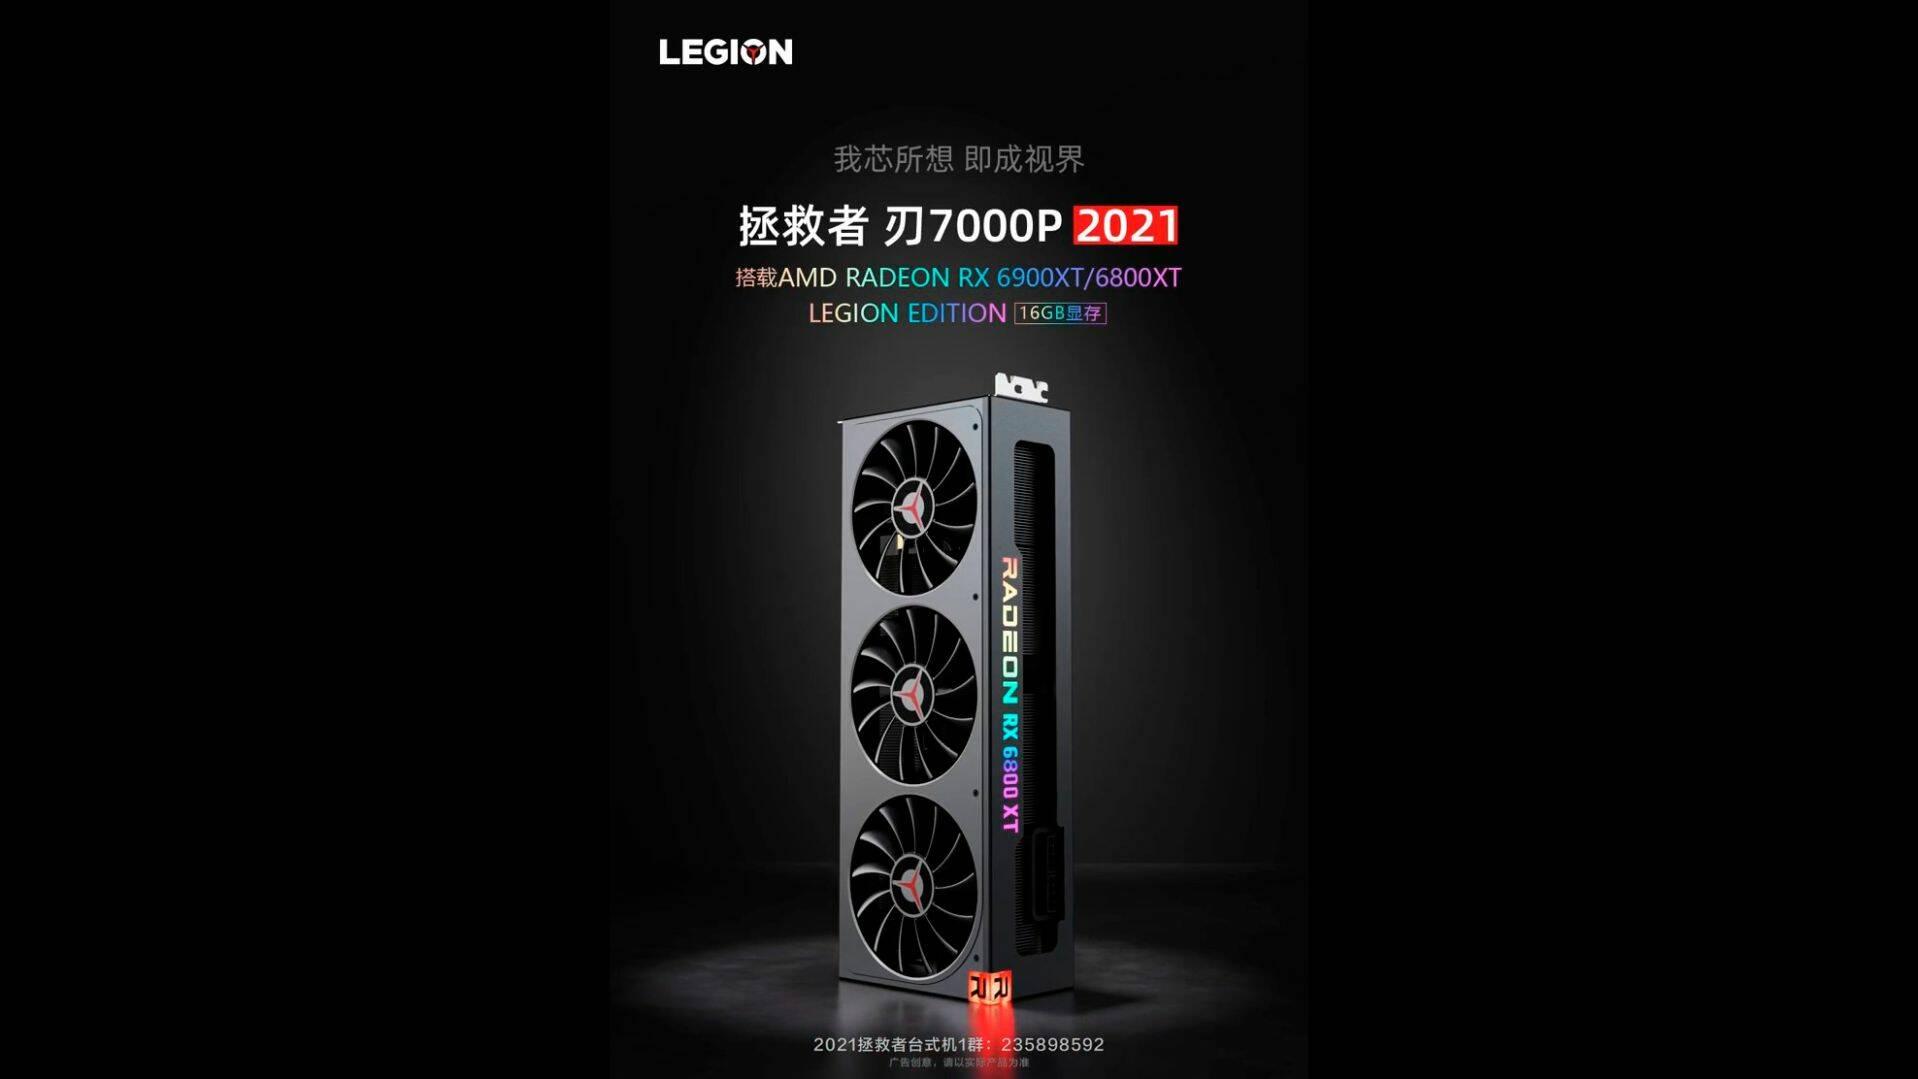 Lenovo Radeon RX 6900 6800 XT Legion Edition